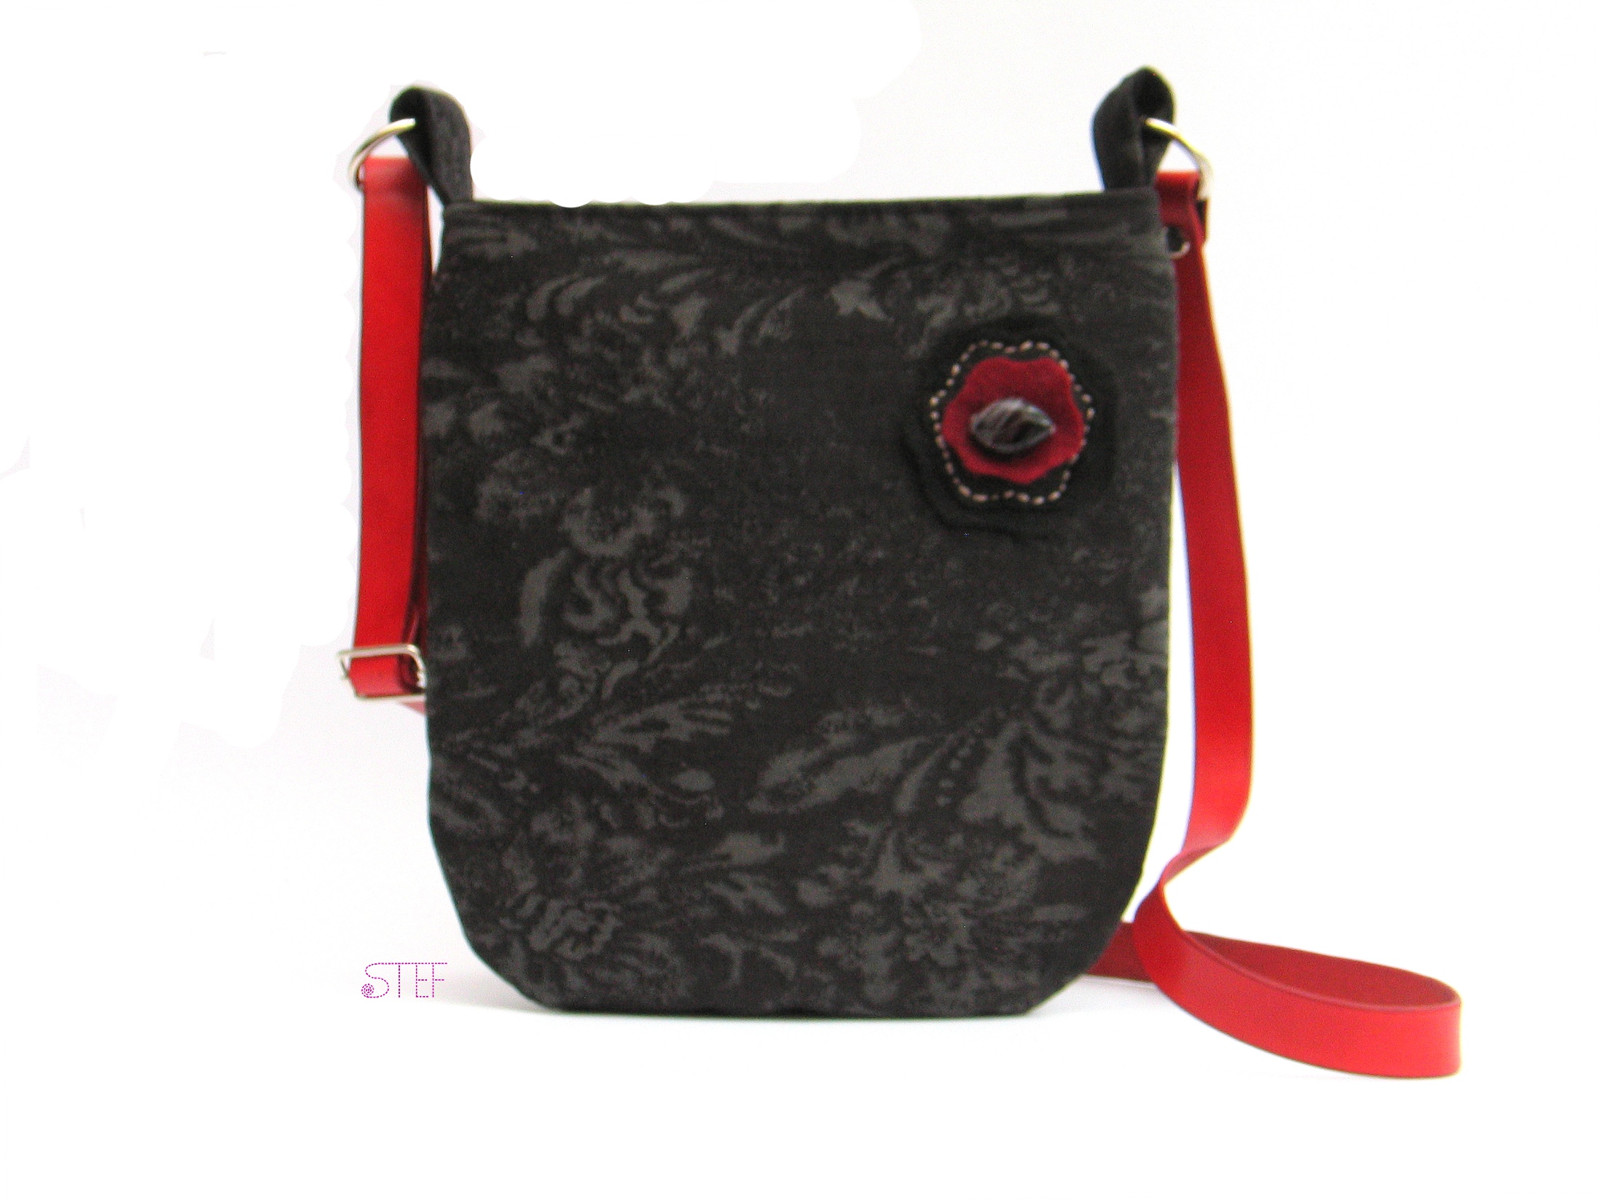 Malá riflová kabelka s koženým uchem - černošedá   Zboží prodejce ... 3ca39f98852